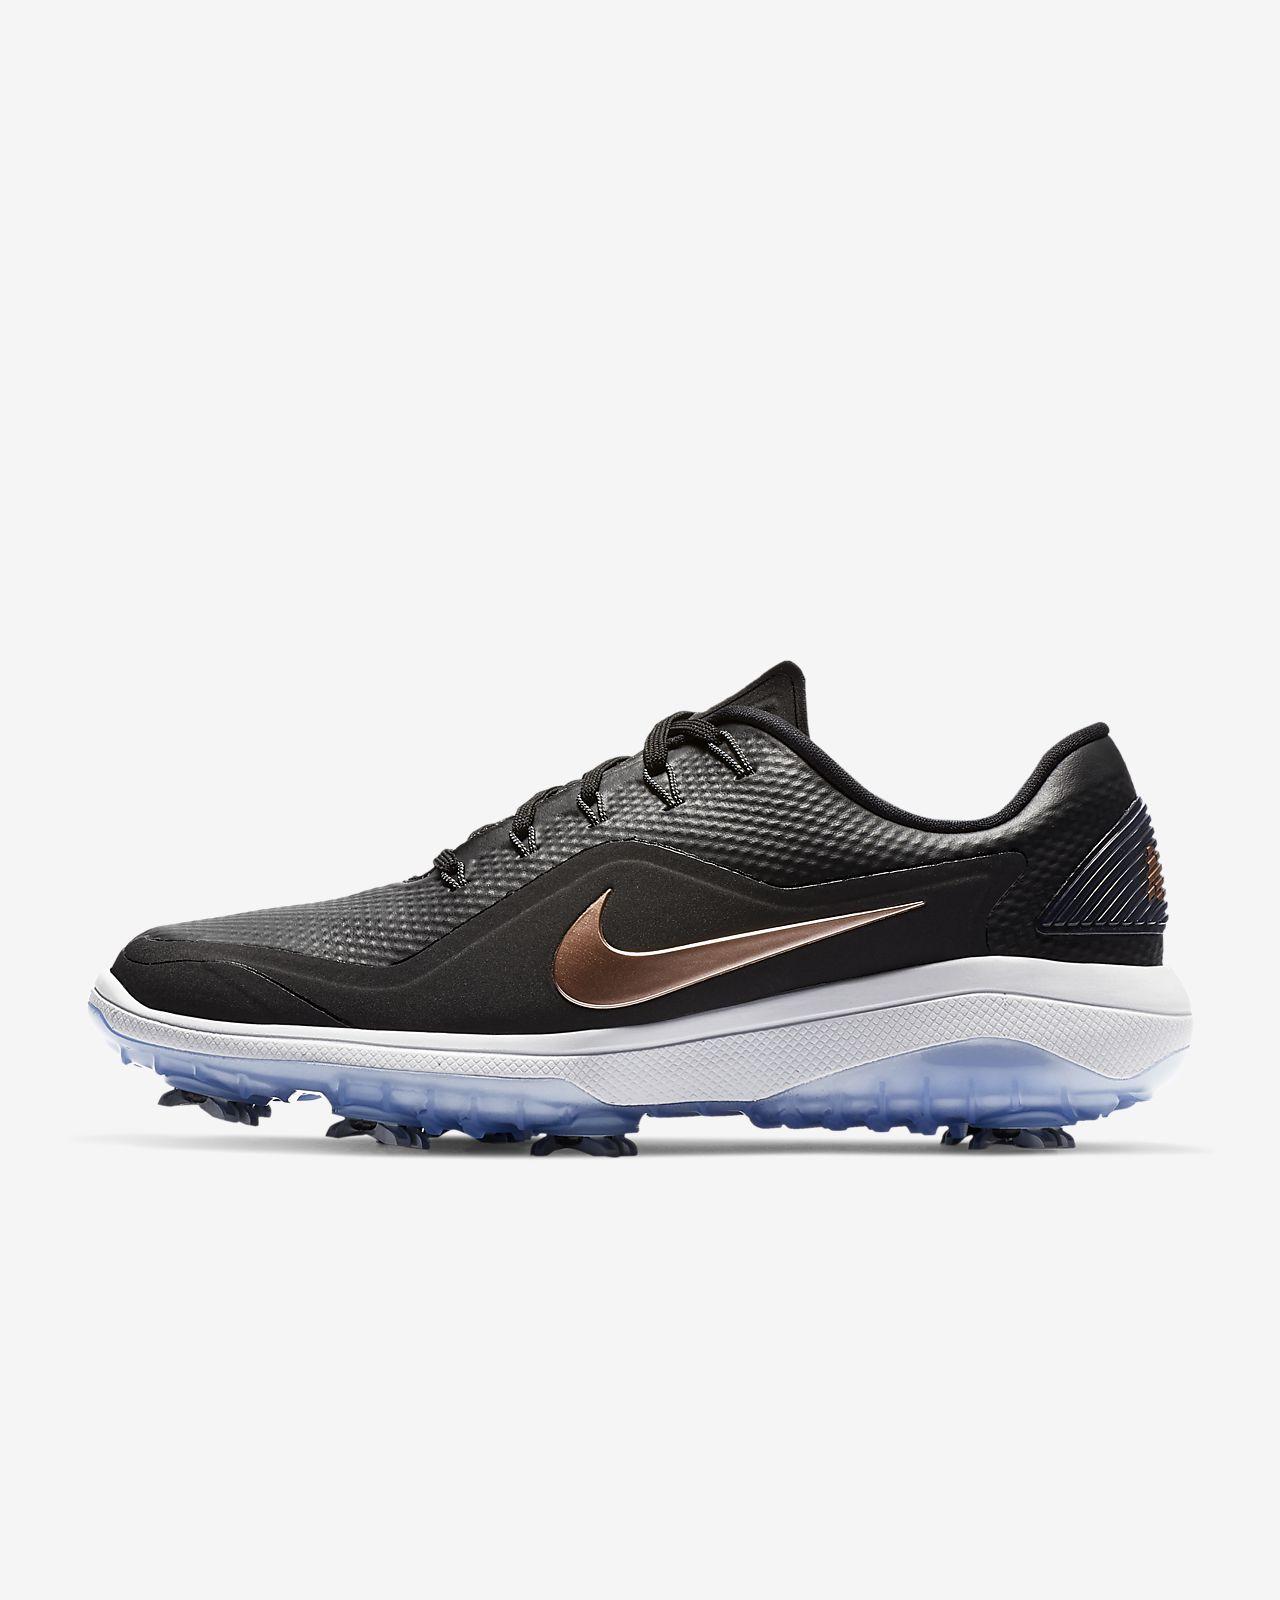 Chaussure de golf Nike React Vapor 2 pour Femme